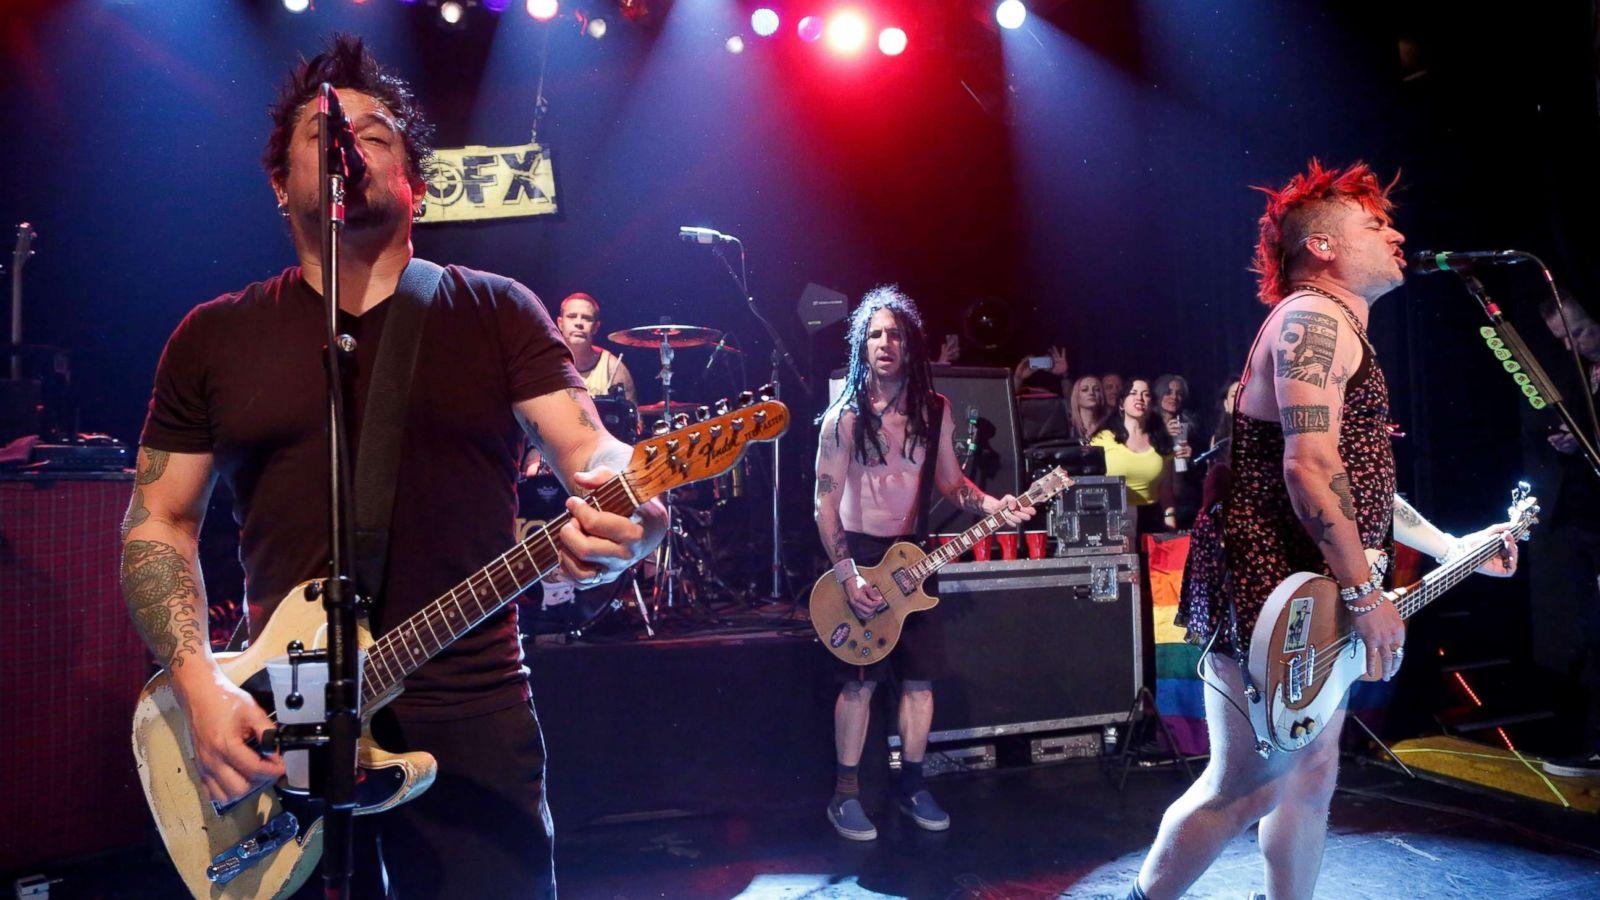 Punk band NOFX loses sponsorship over insensitive joke about Las 1600x900